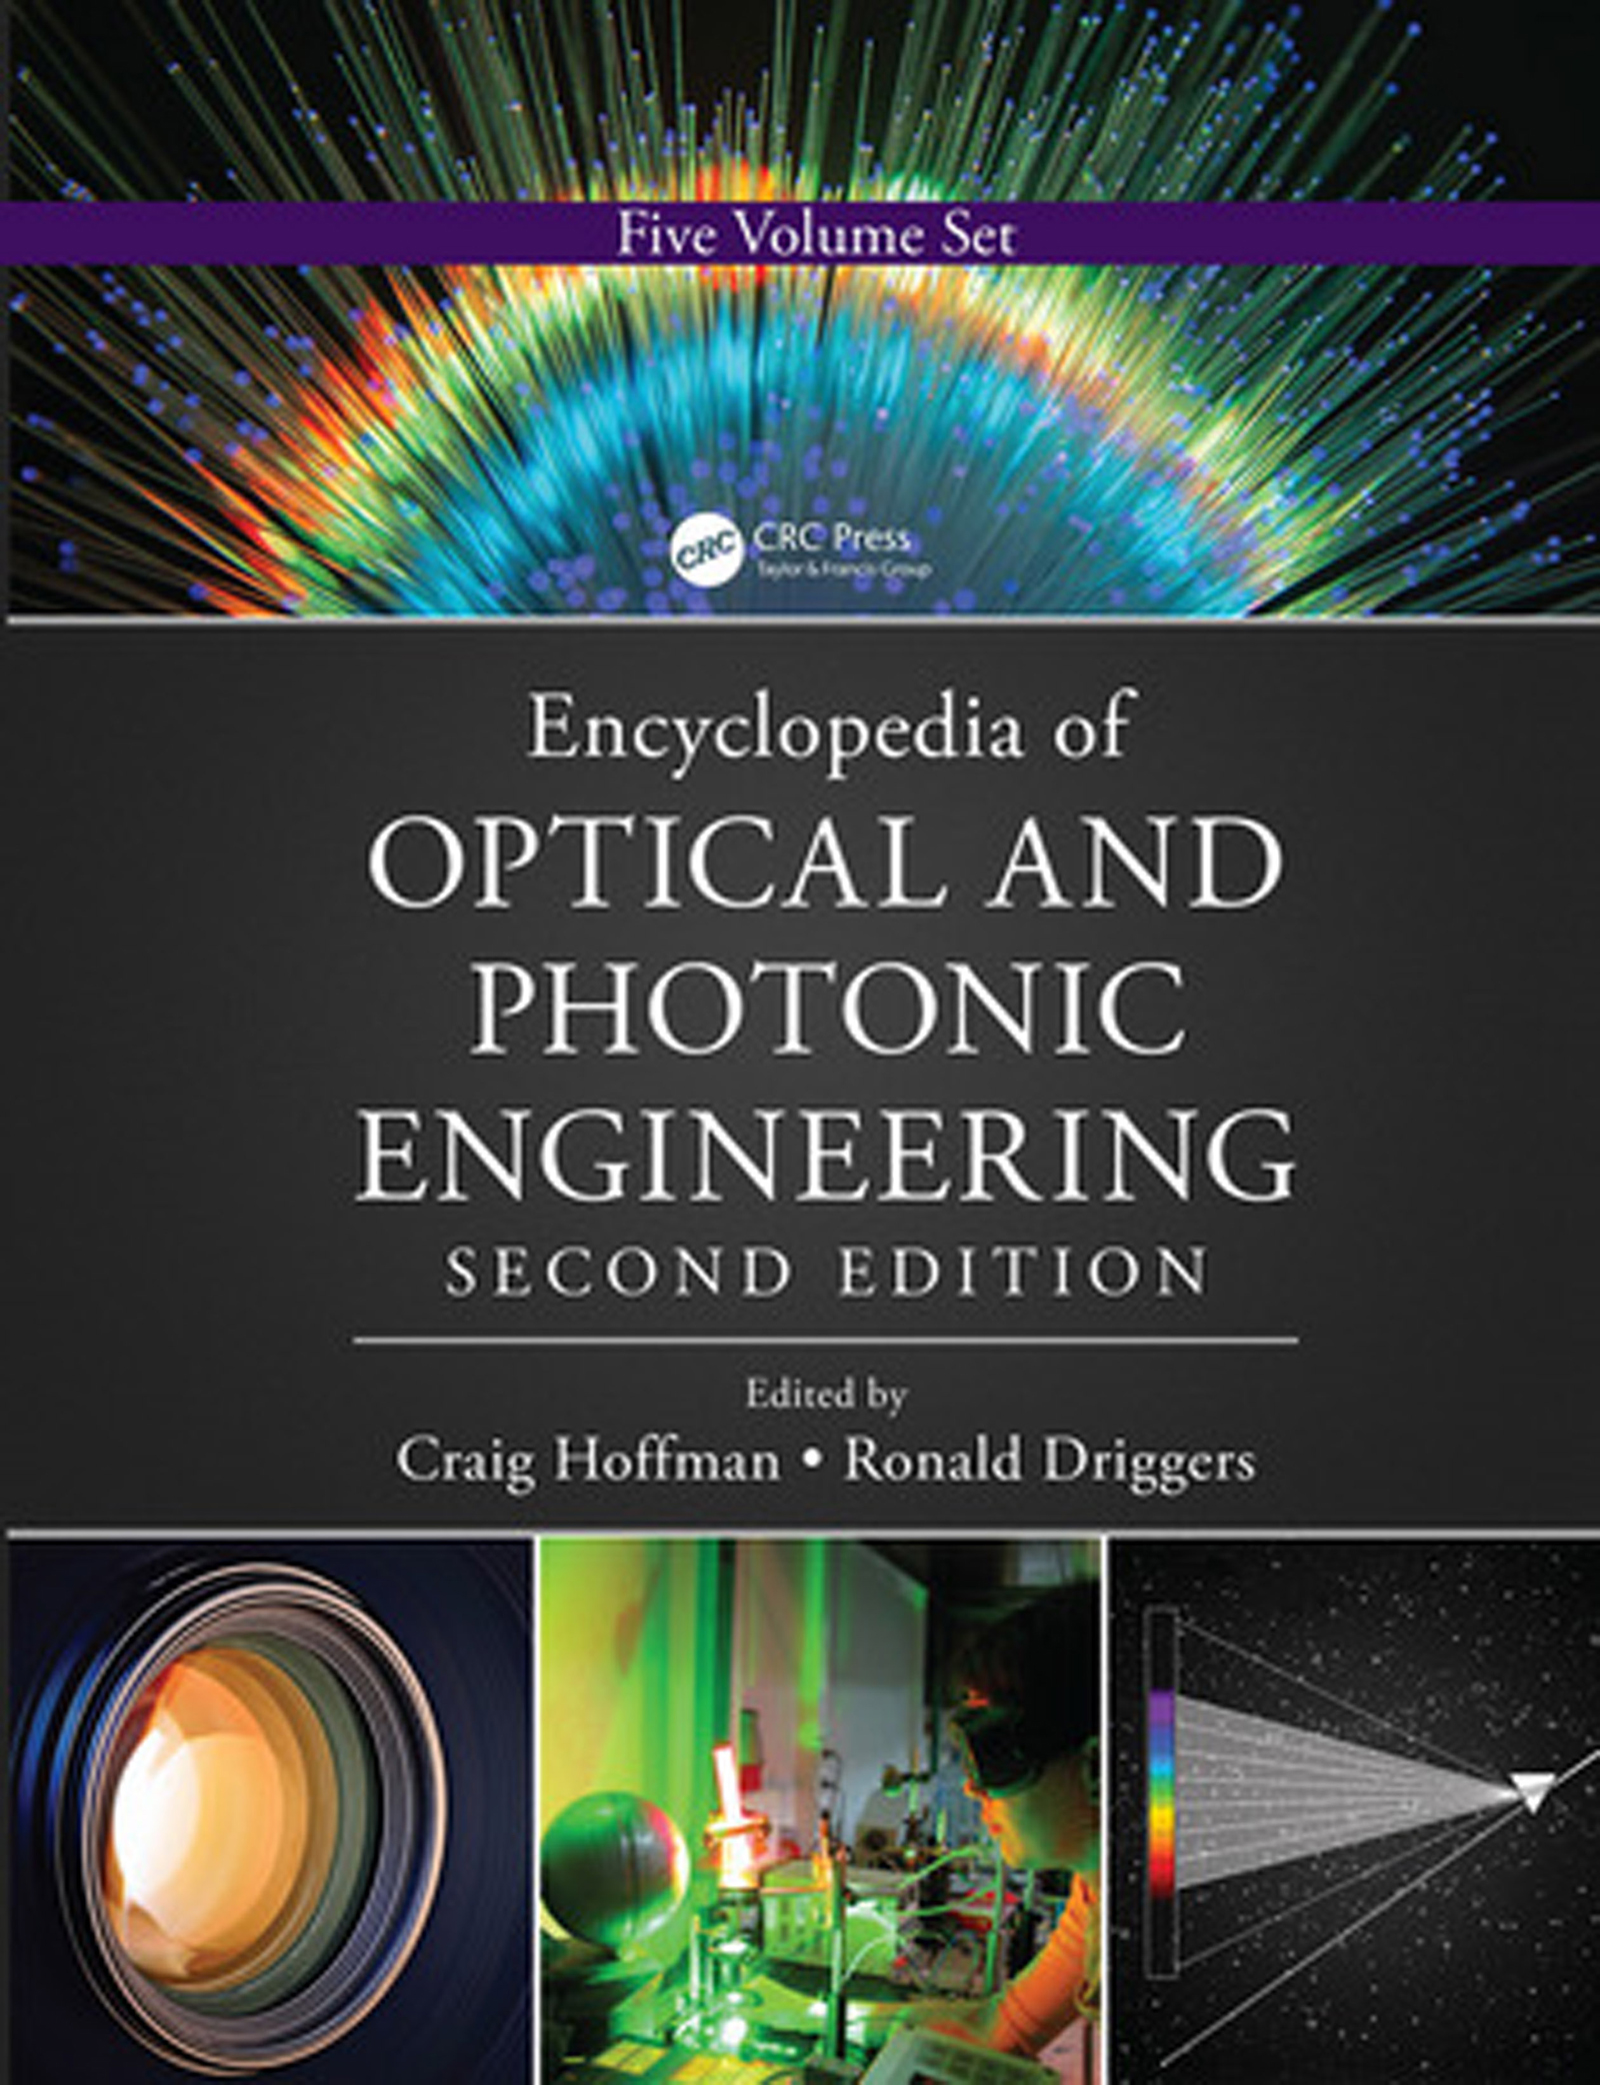 Encyclopedia of Optical and Photonic Engineering (Print) - Five Volume Set